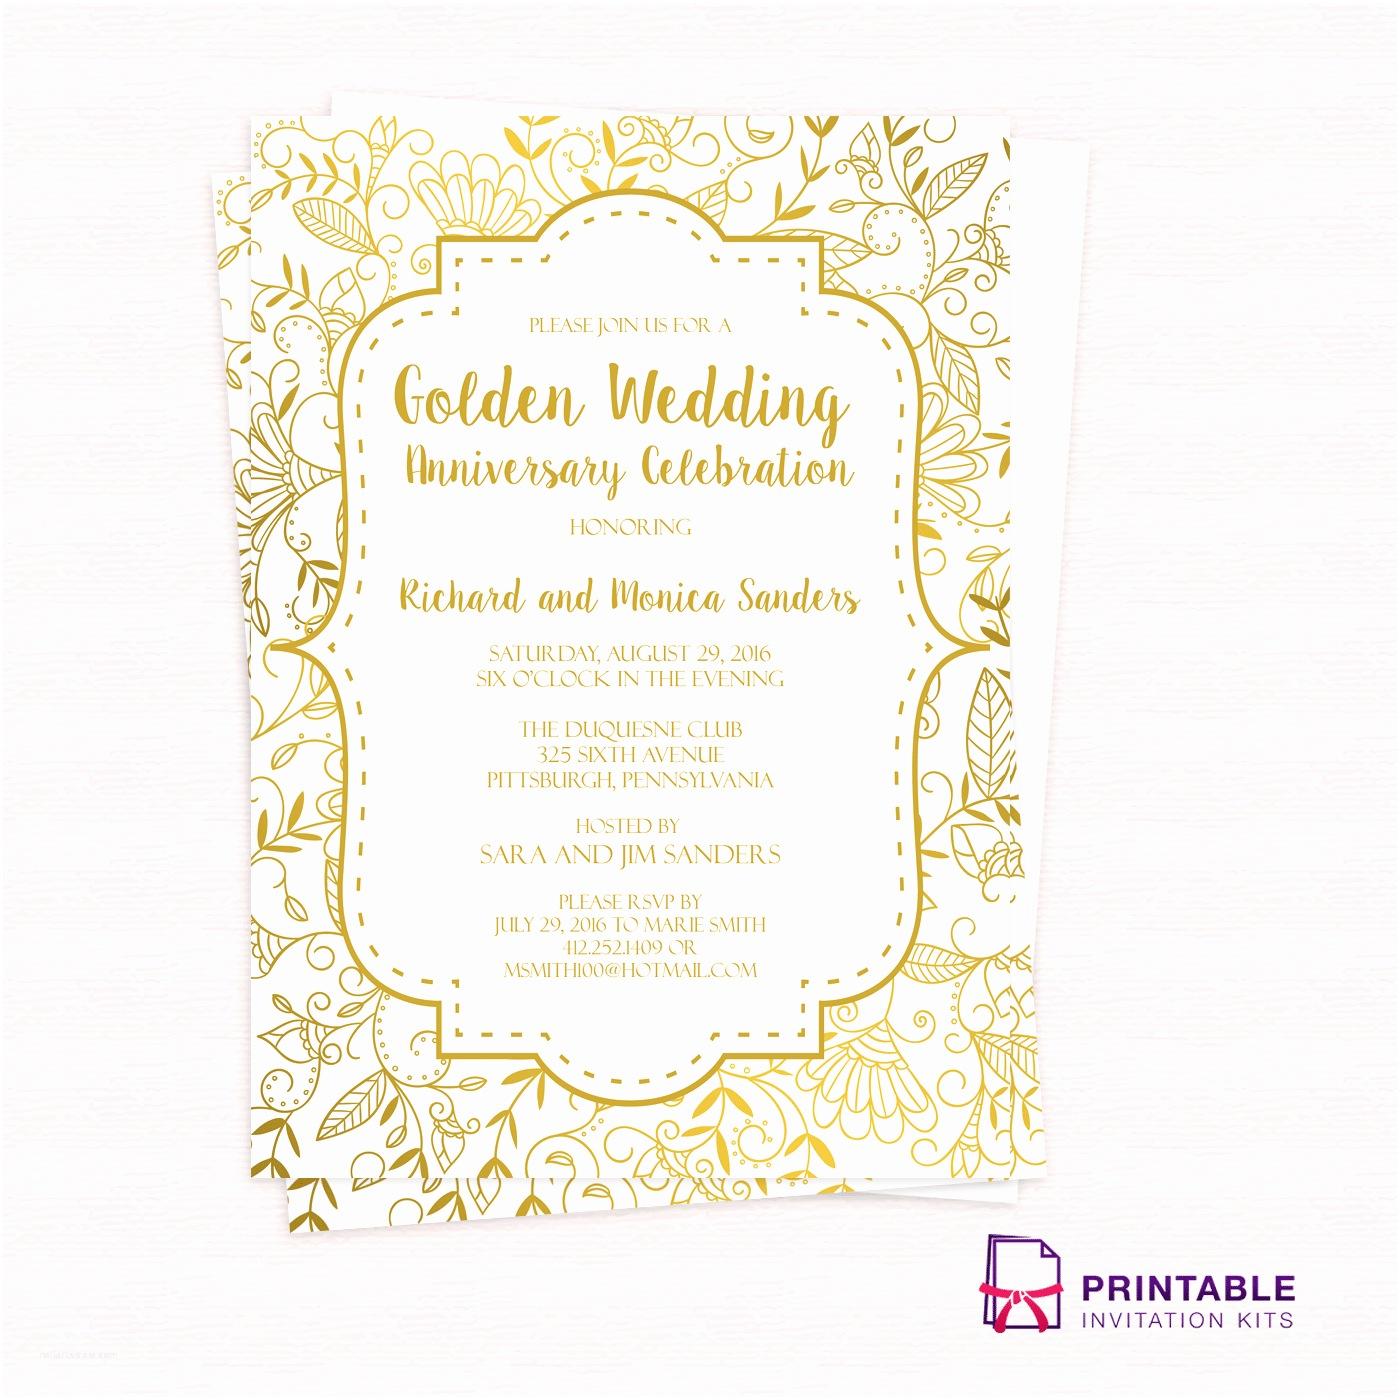 Wedding Anniversary Invitations In Spanish 50th Wedding Anniversary Invitation Wording Samples In